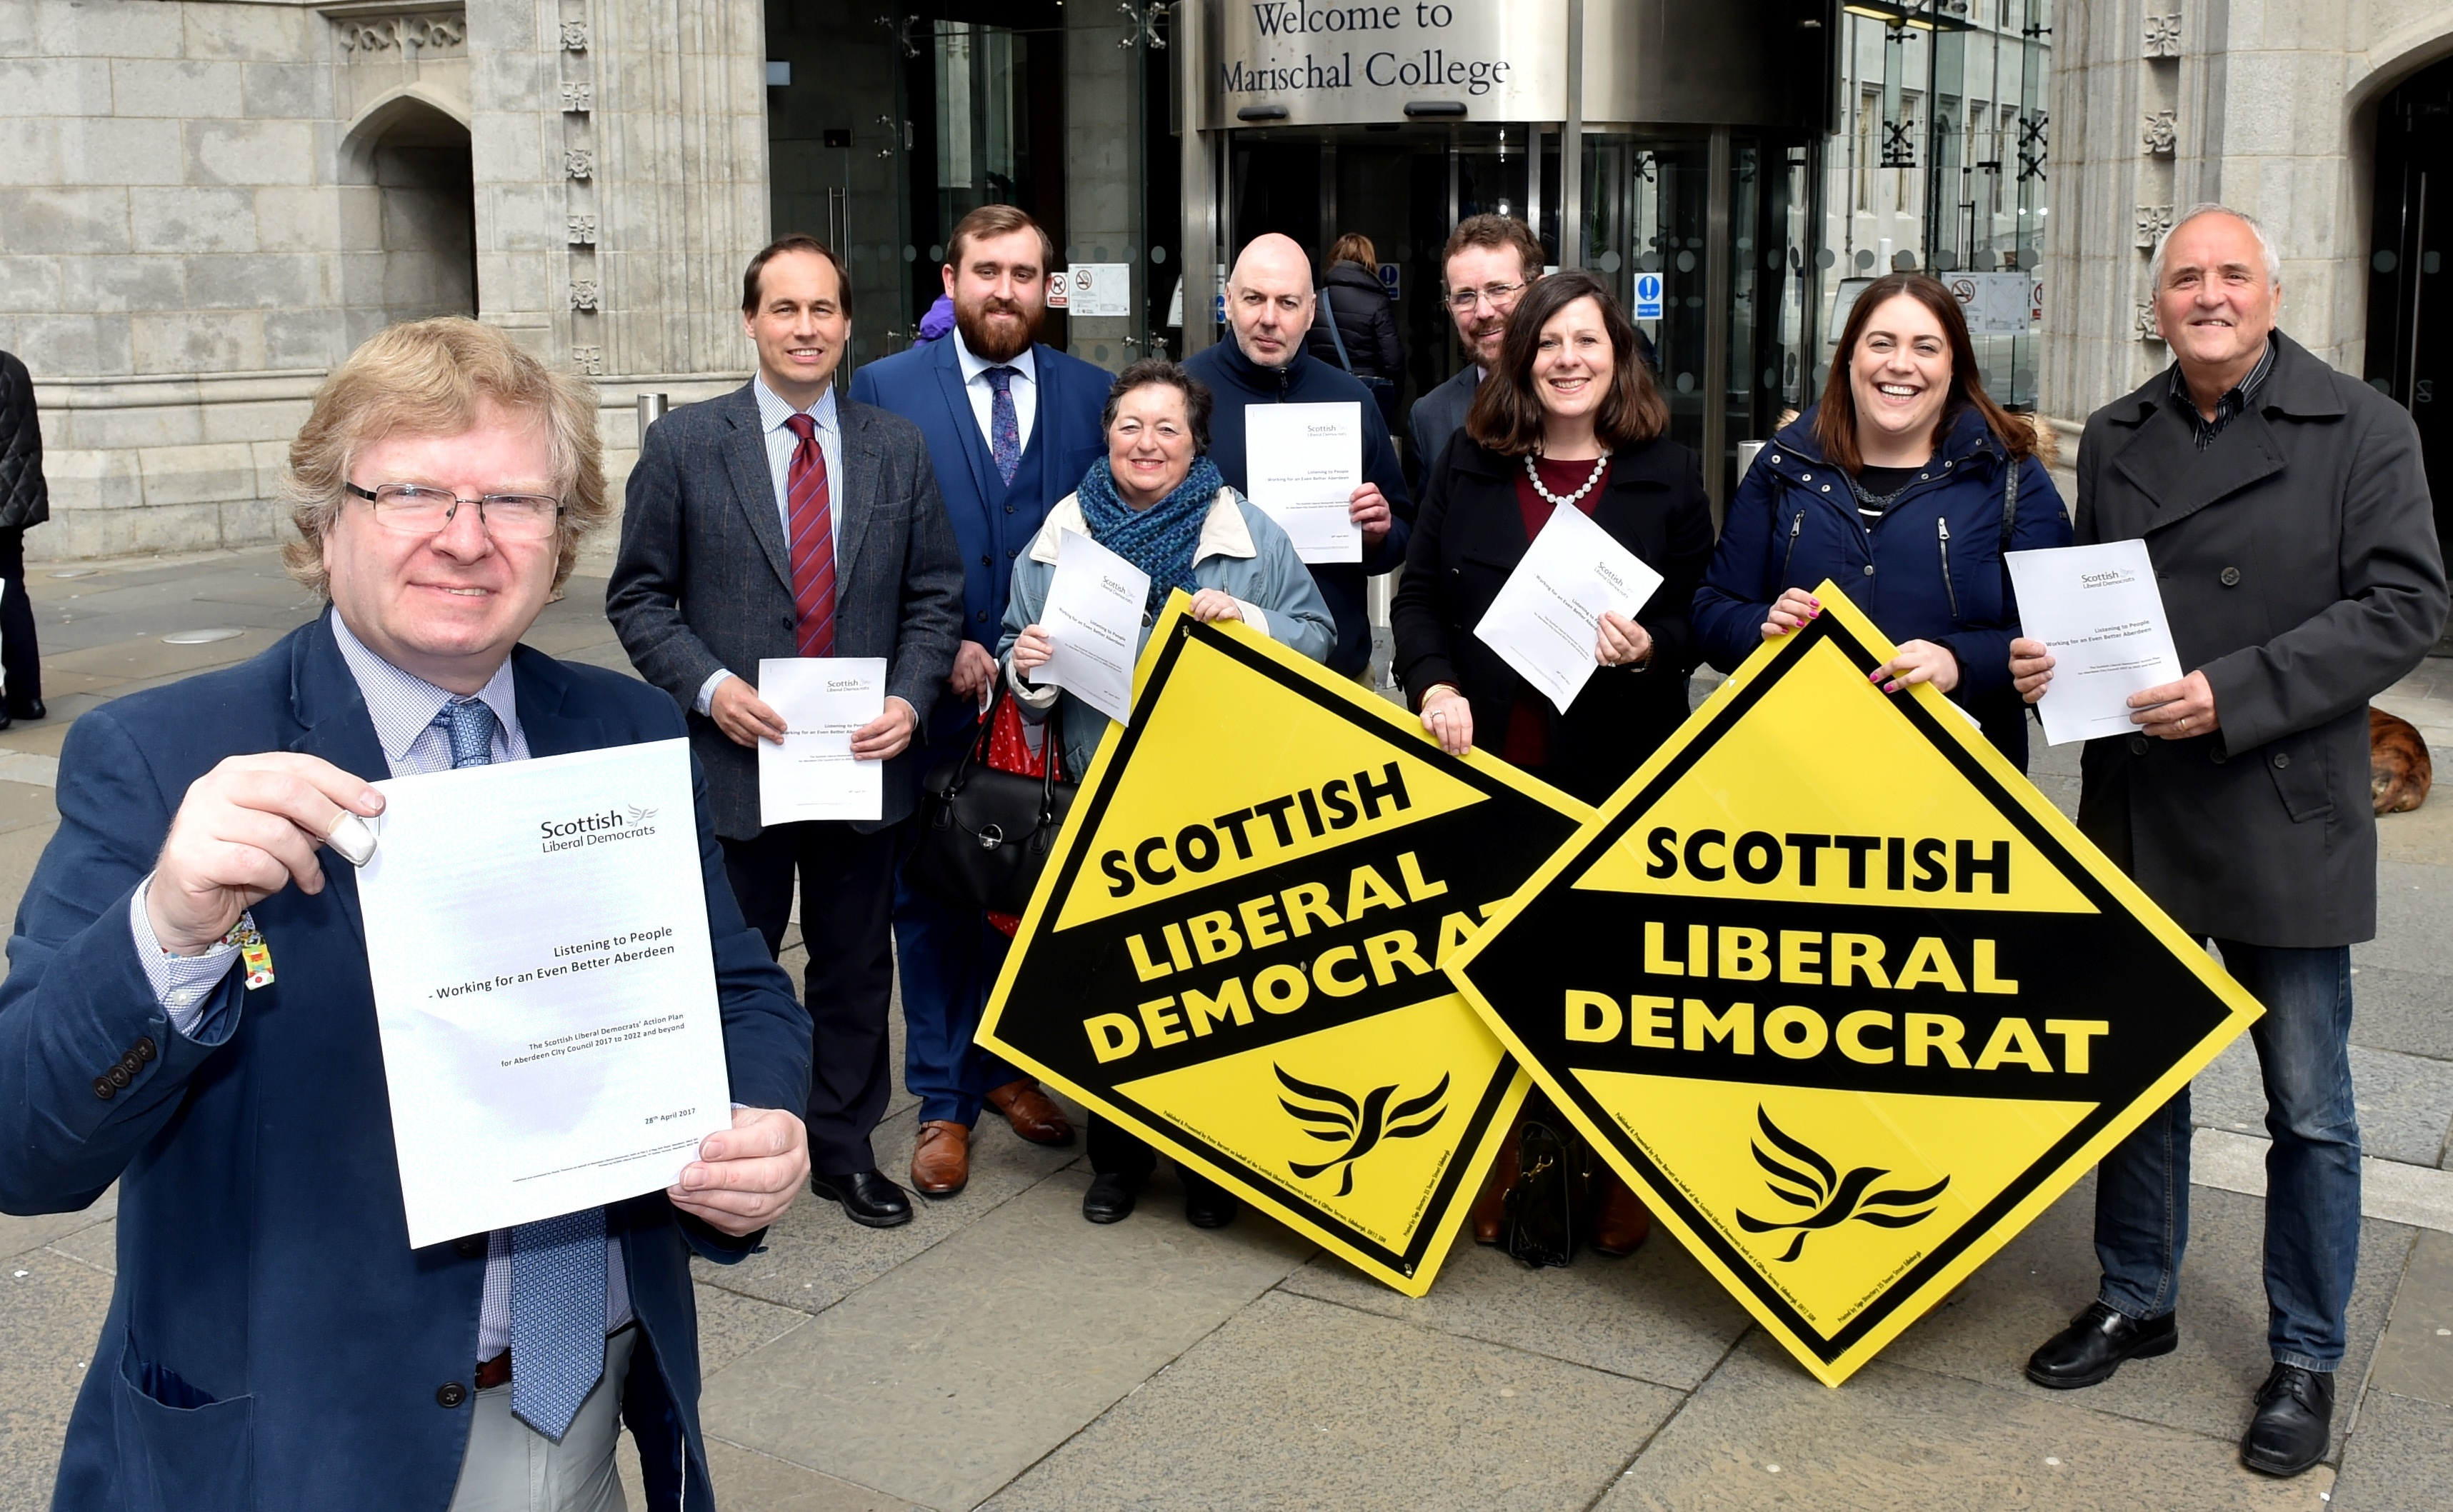 Liberal Democrat hopefuls, from left, Iain Yuill Martin Greig, Cameron Finnie, Dorothy Pearce, Gregor McAbery, Steve Delaney, Jennifer Stewart, Jenny Wilson and Ken McLeod.